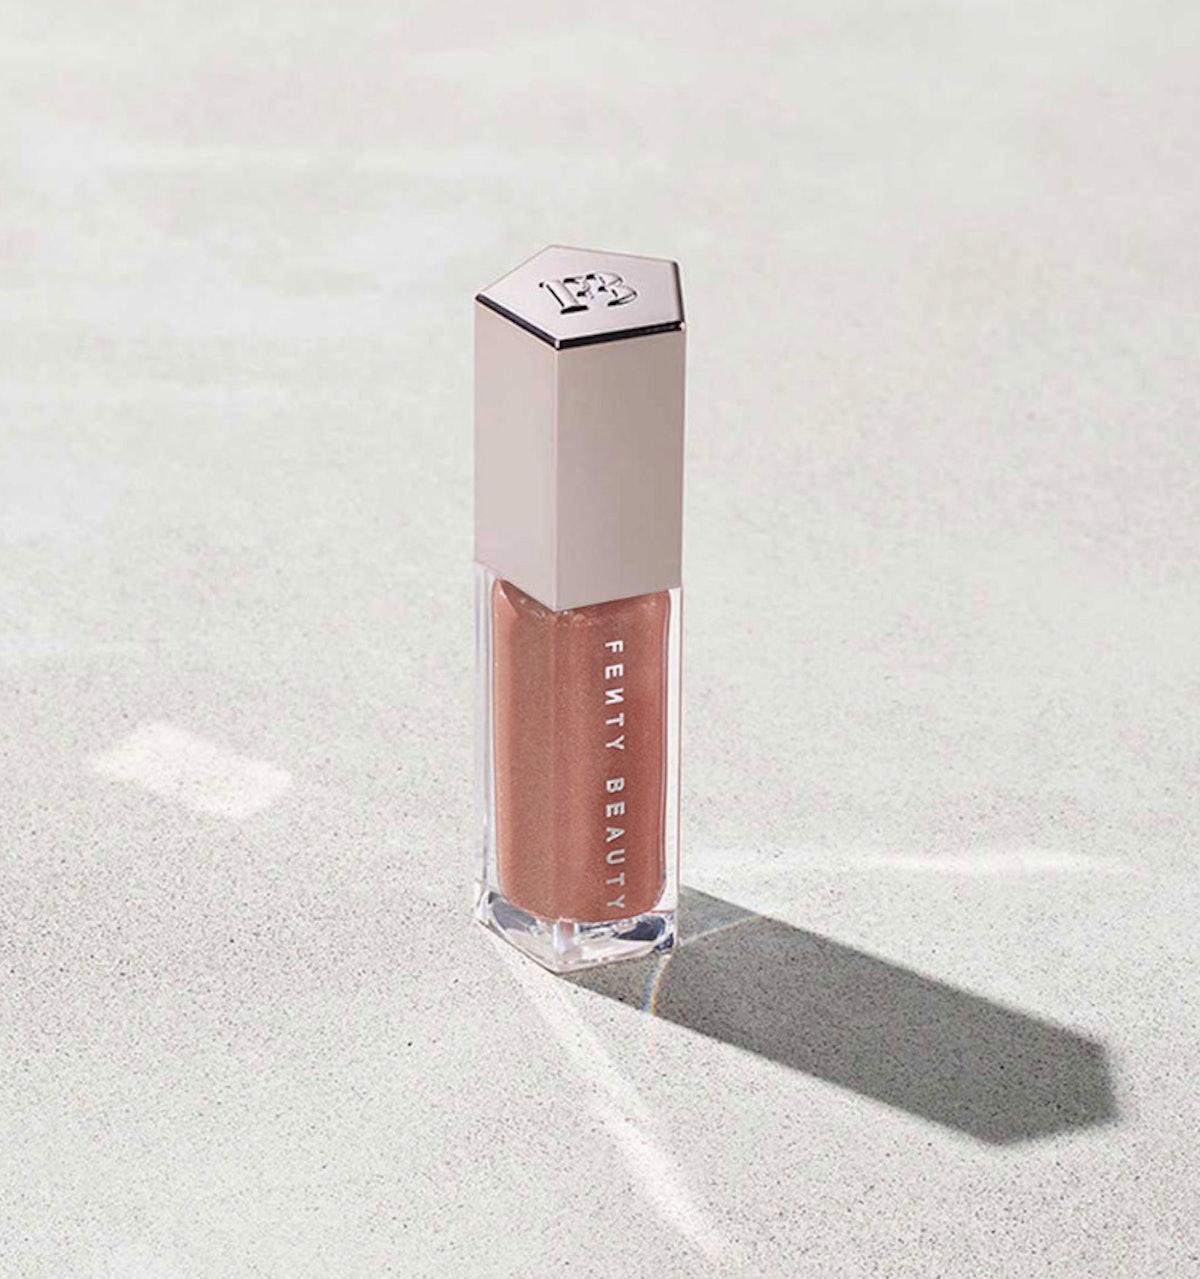 Gloss Bomb Universal Lip Luminizer In Fenty Glow